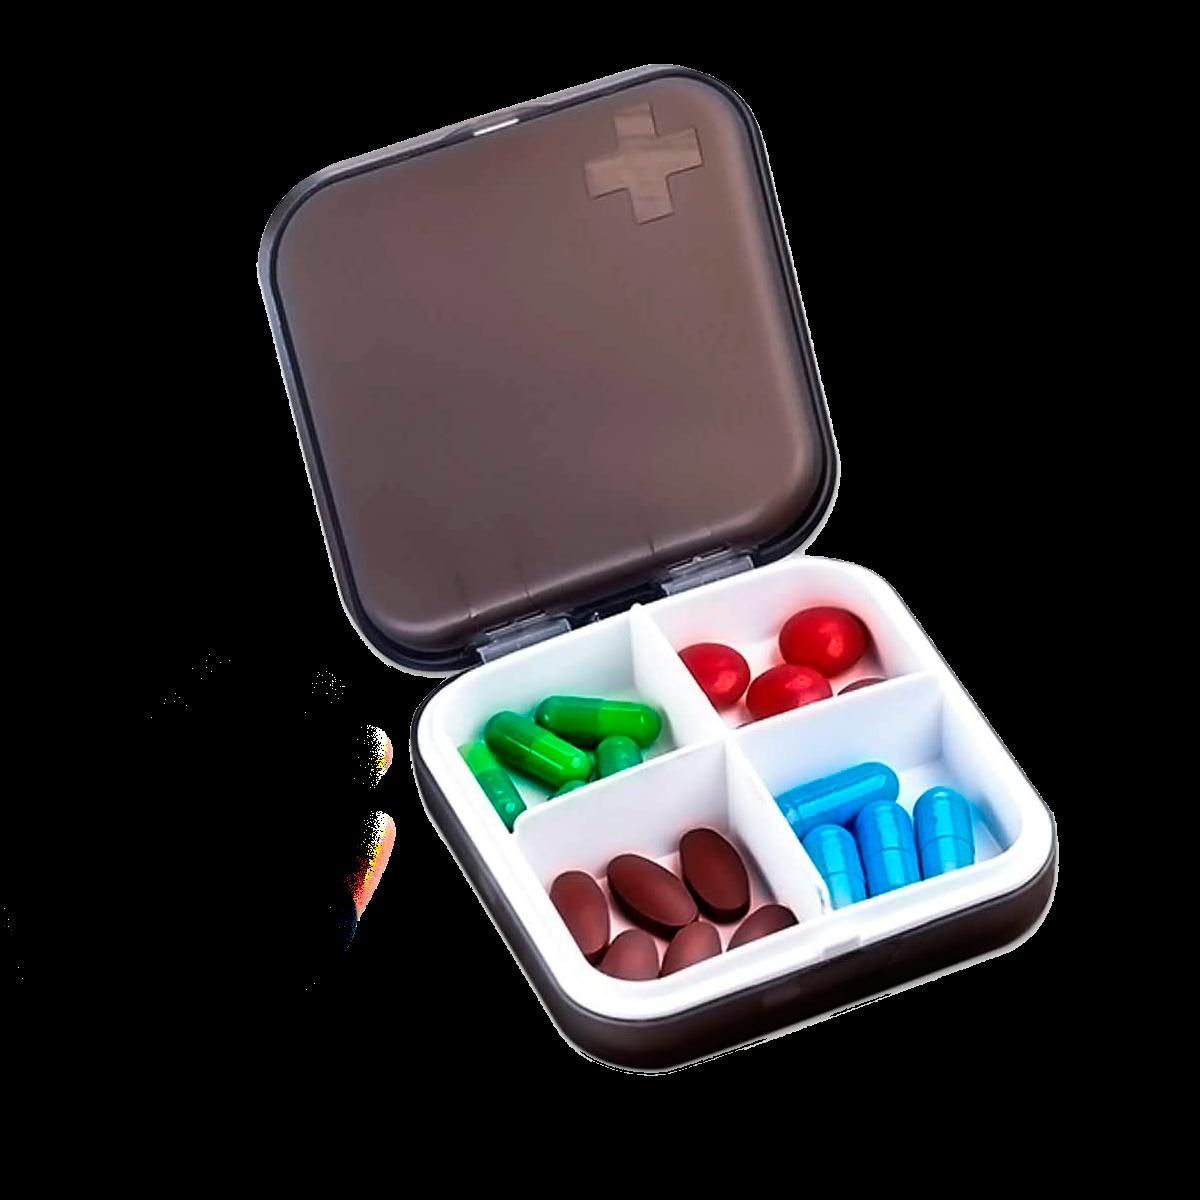 Portable pill organizer